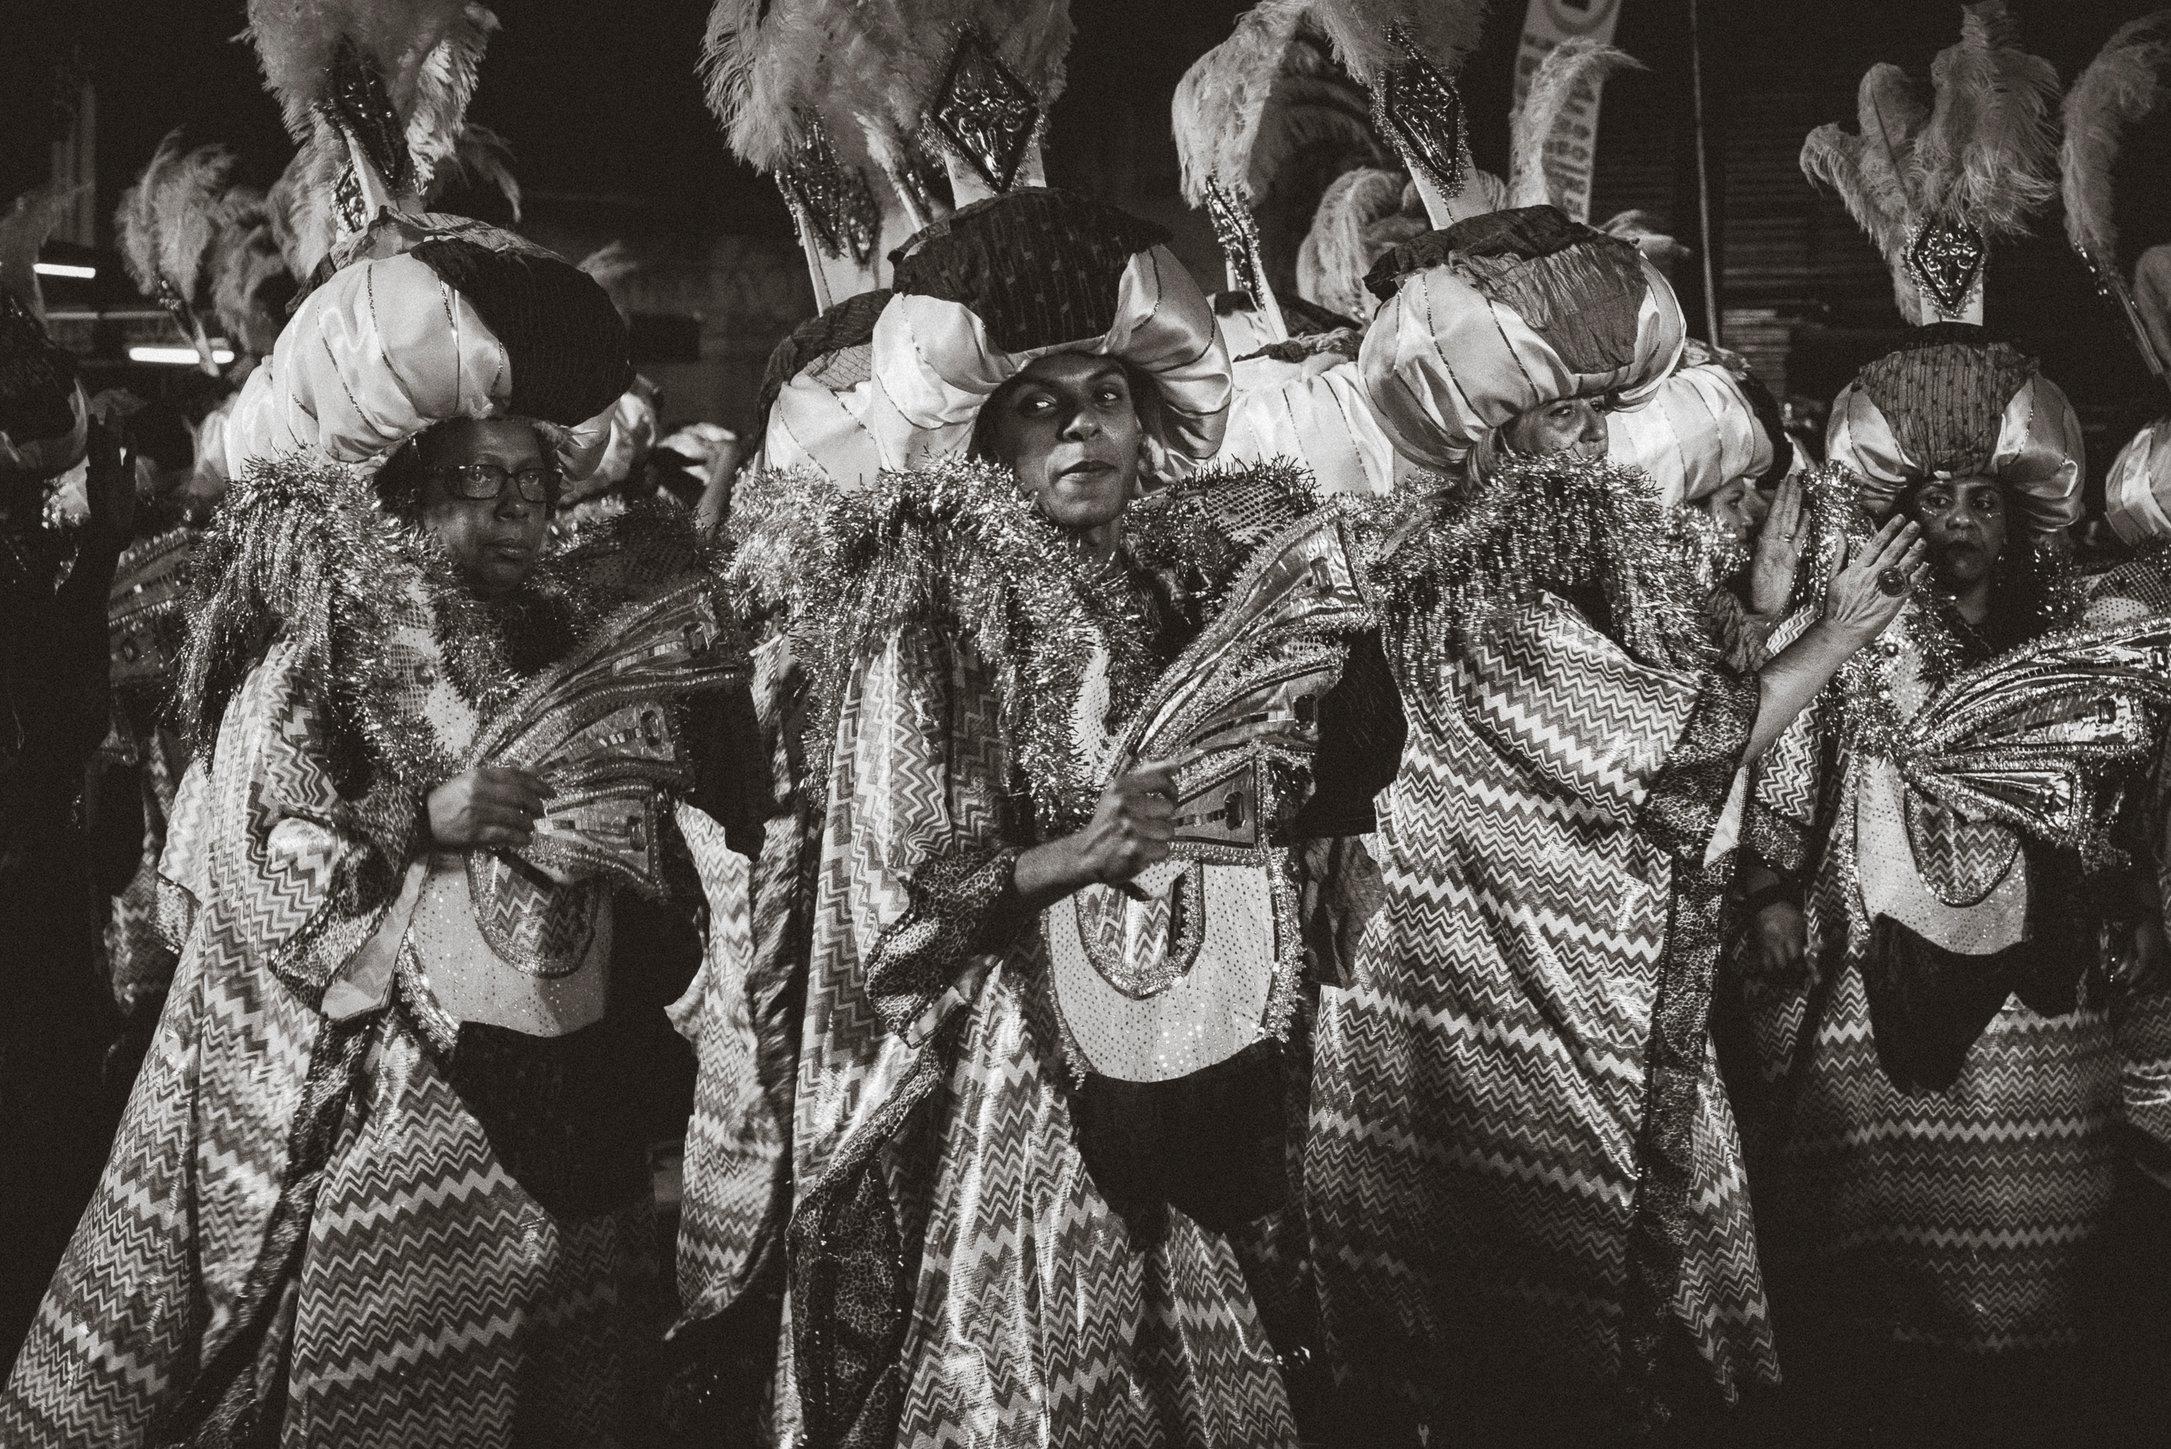 20180212-Carnaval-92.jpg